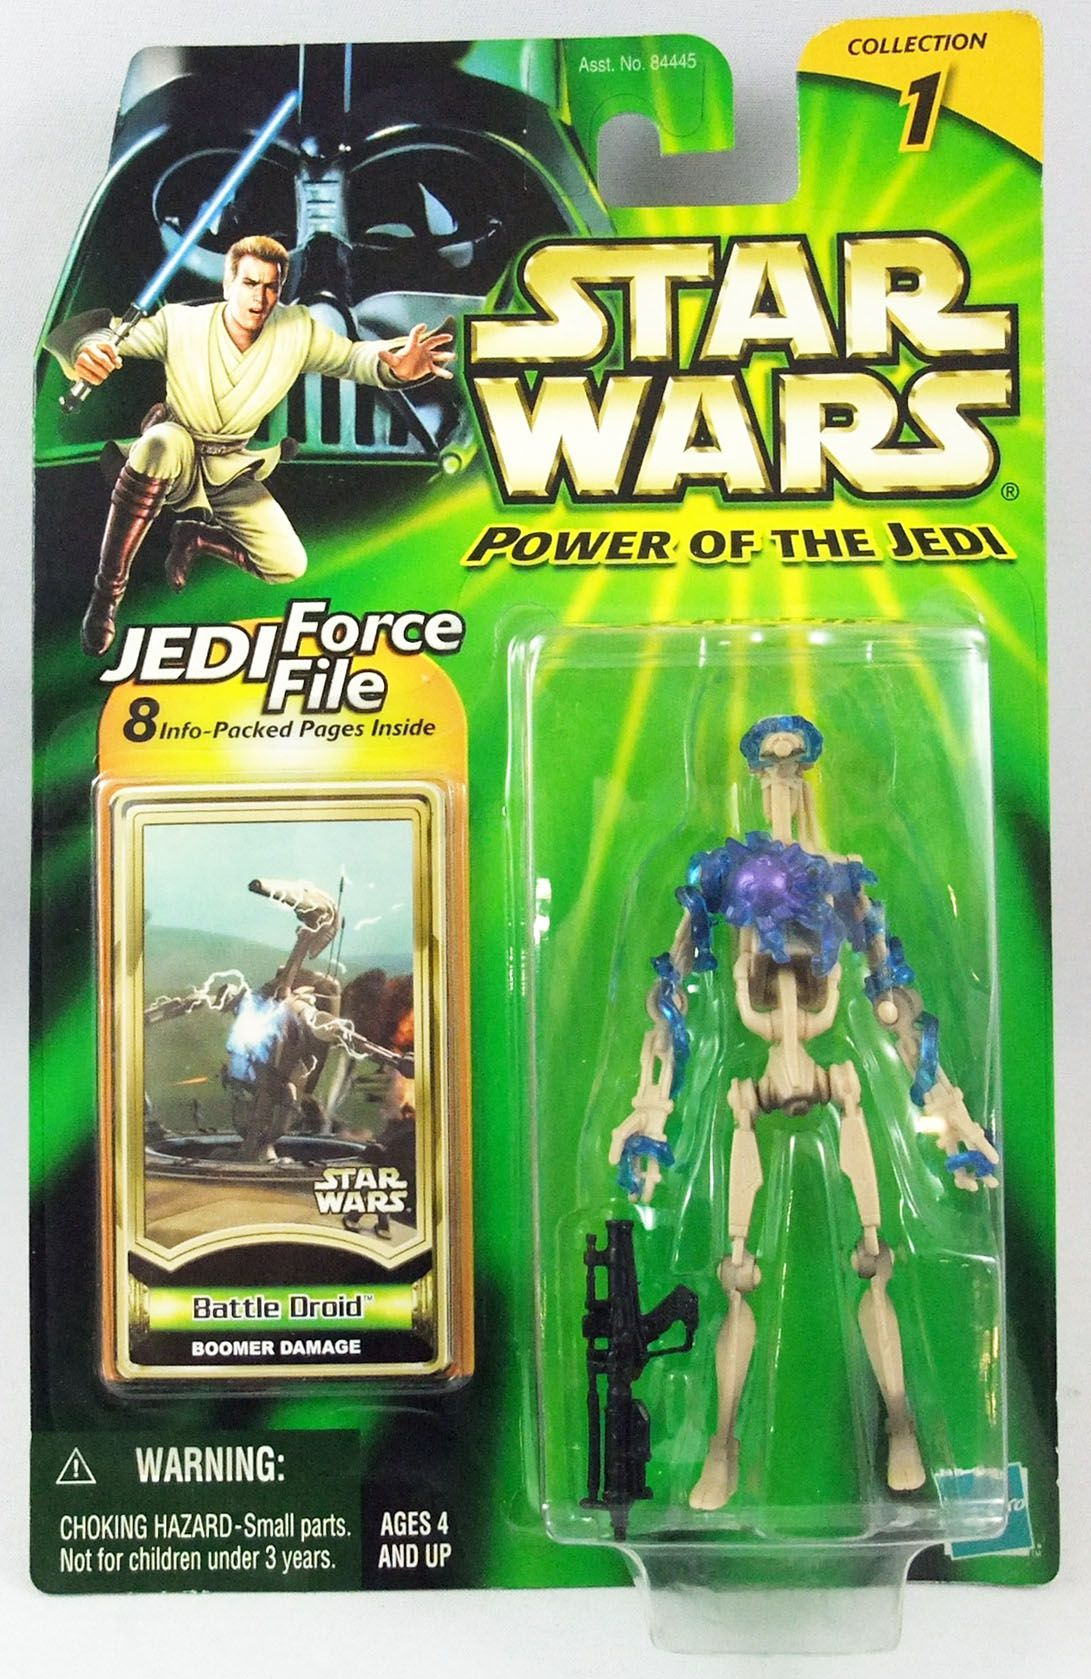 Star Wars (Power of the Jedi) - Hasbro - Battle Droid (Boomer Damage)